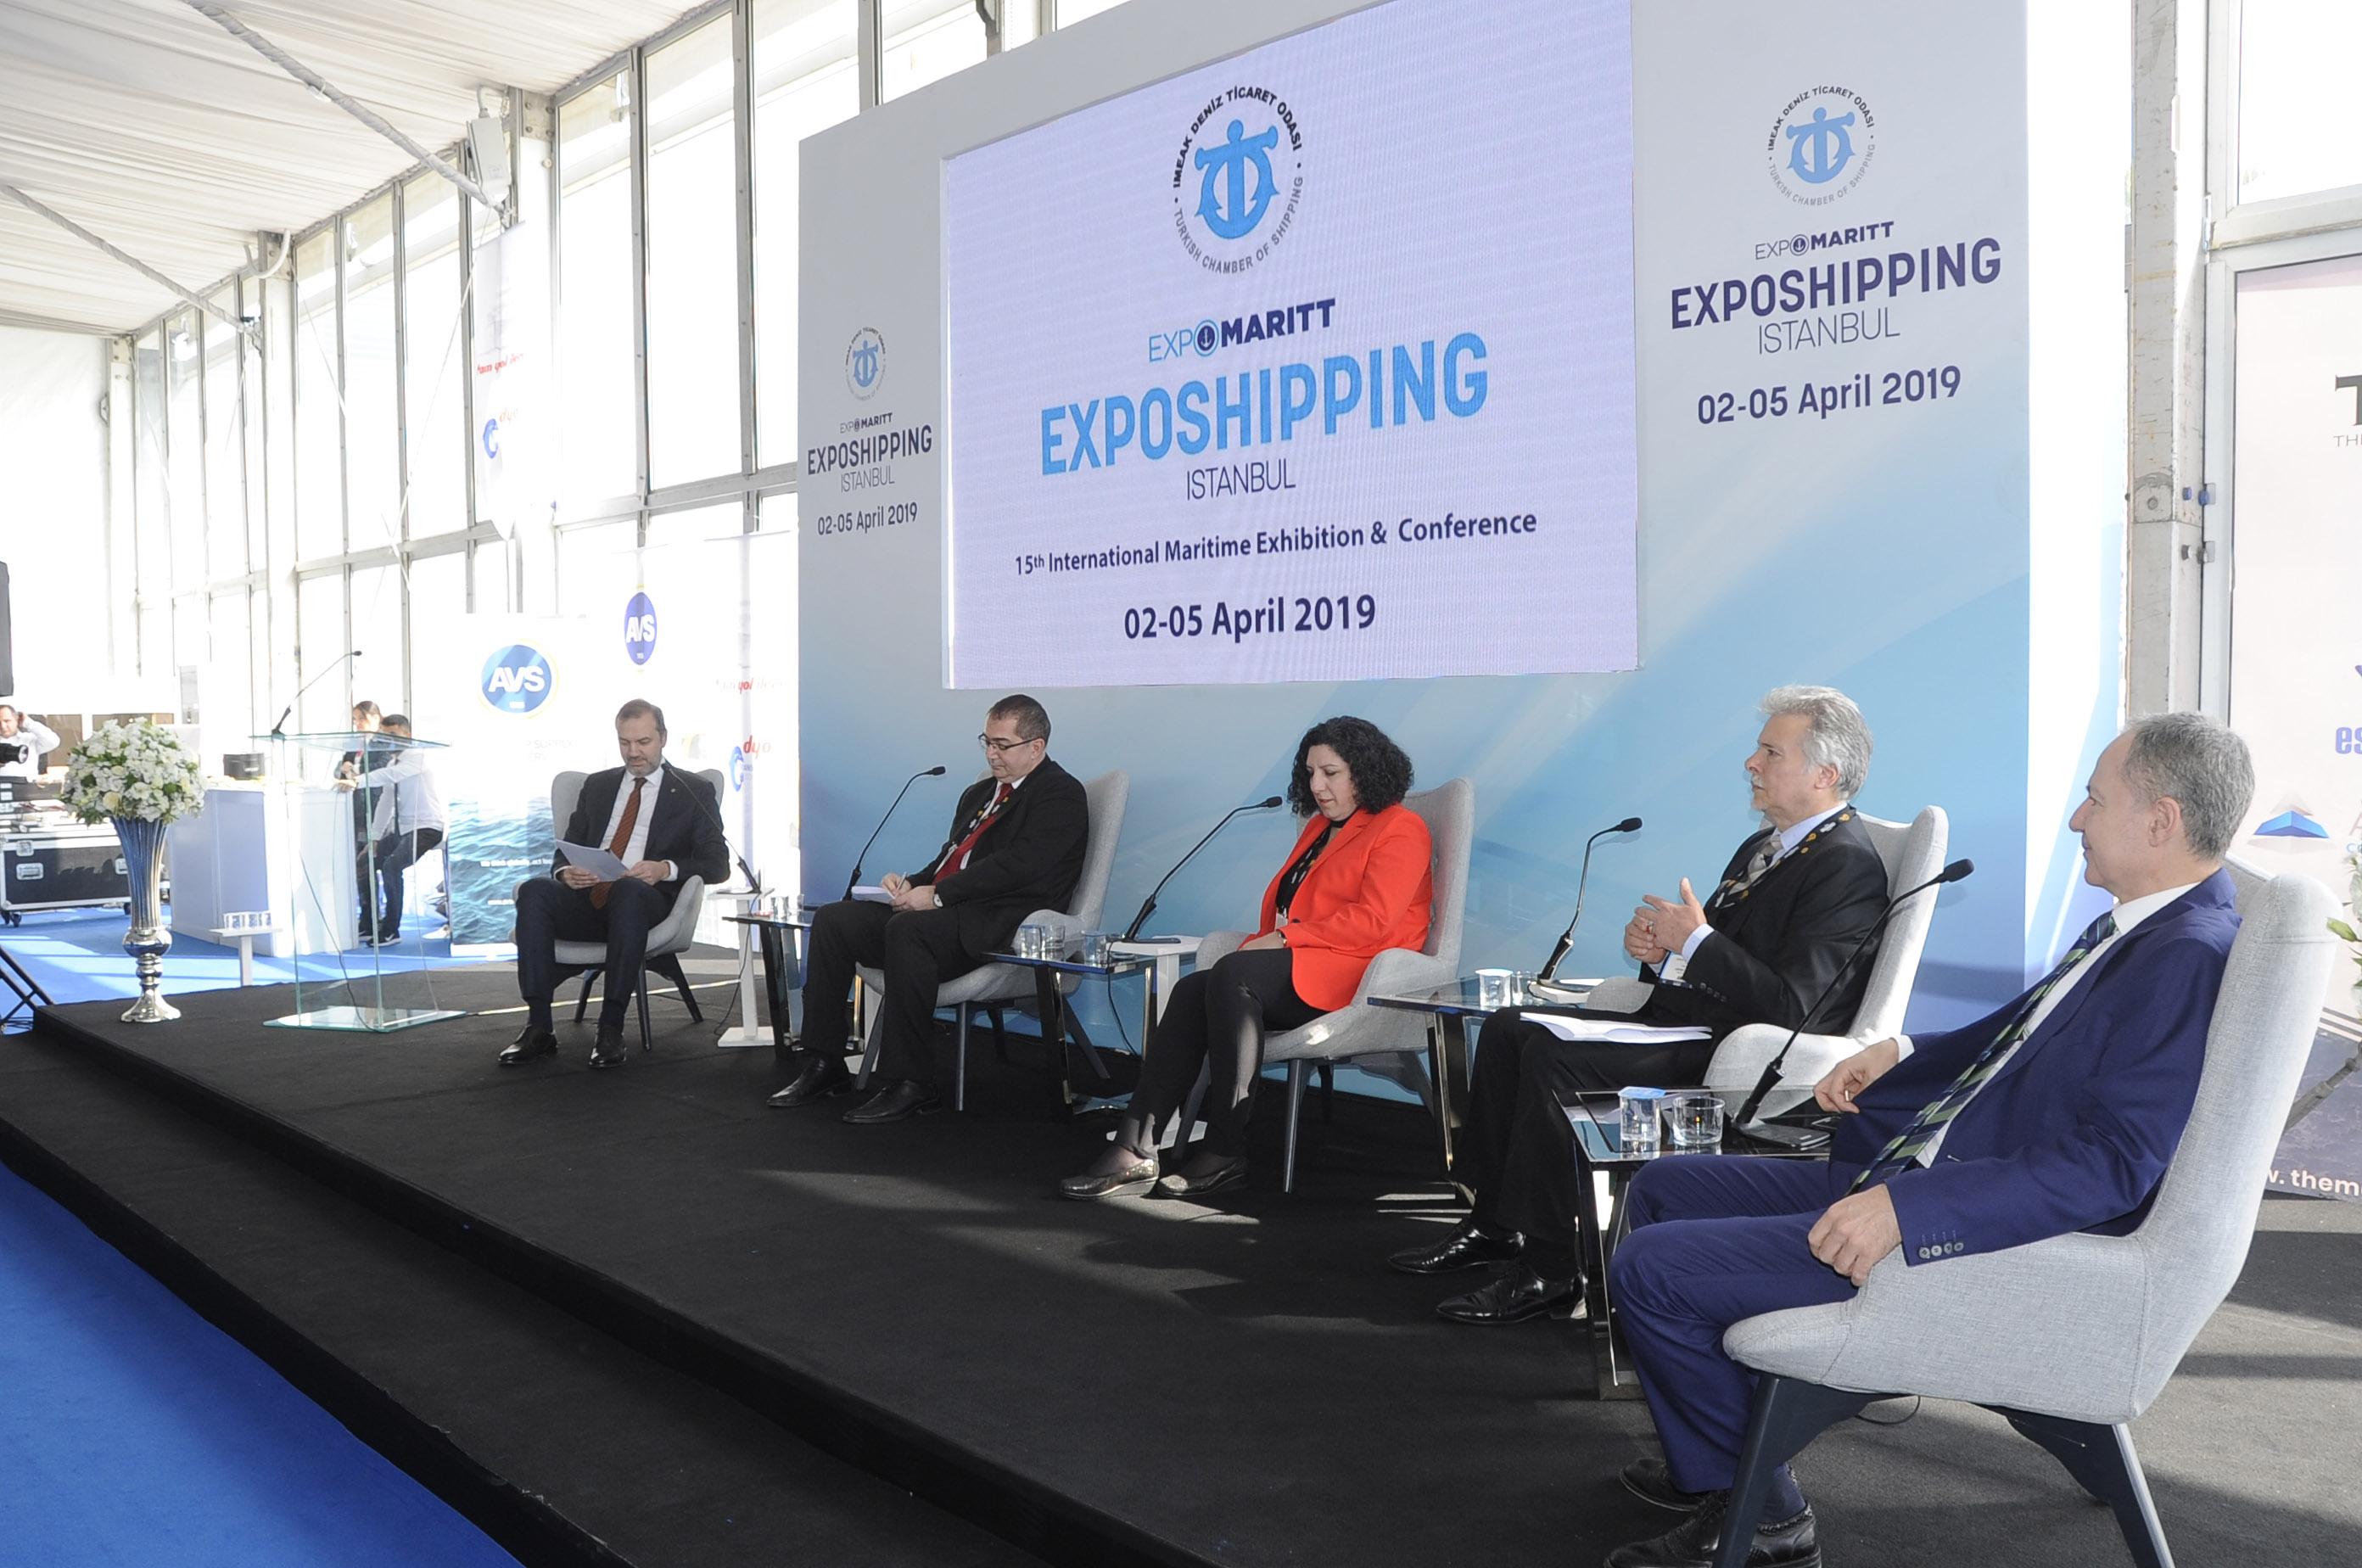 1554459700-global-maritime-summit-exposhipping-6.JPG